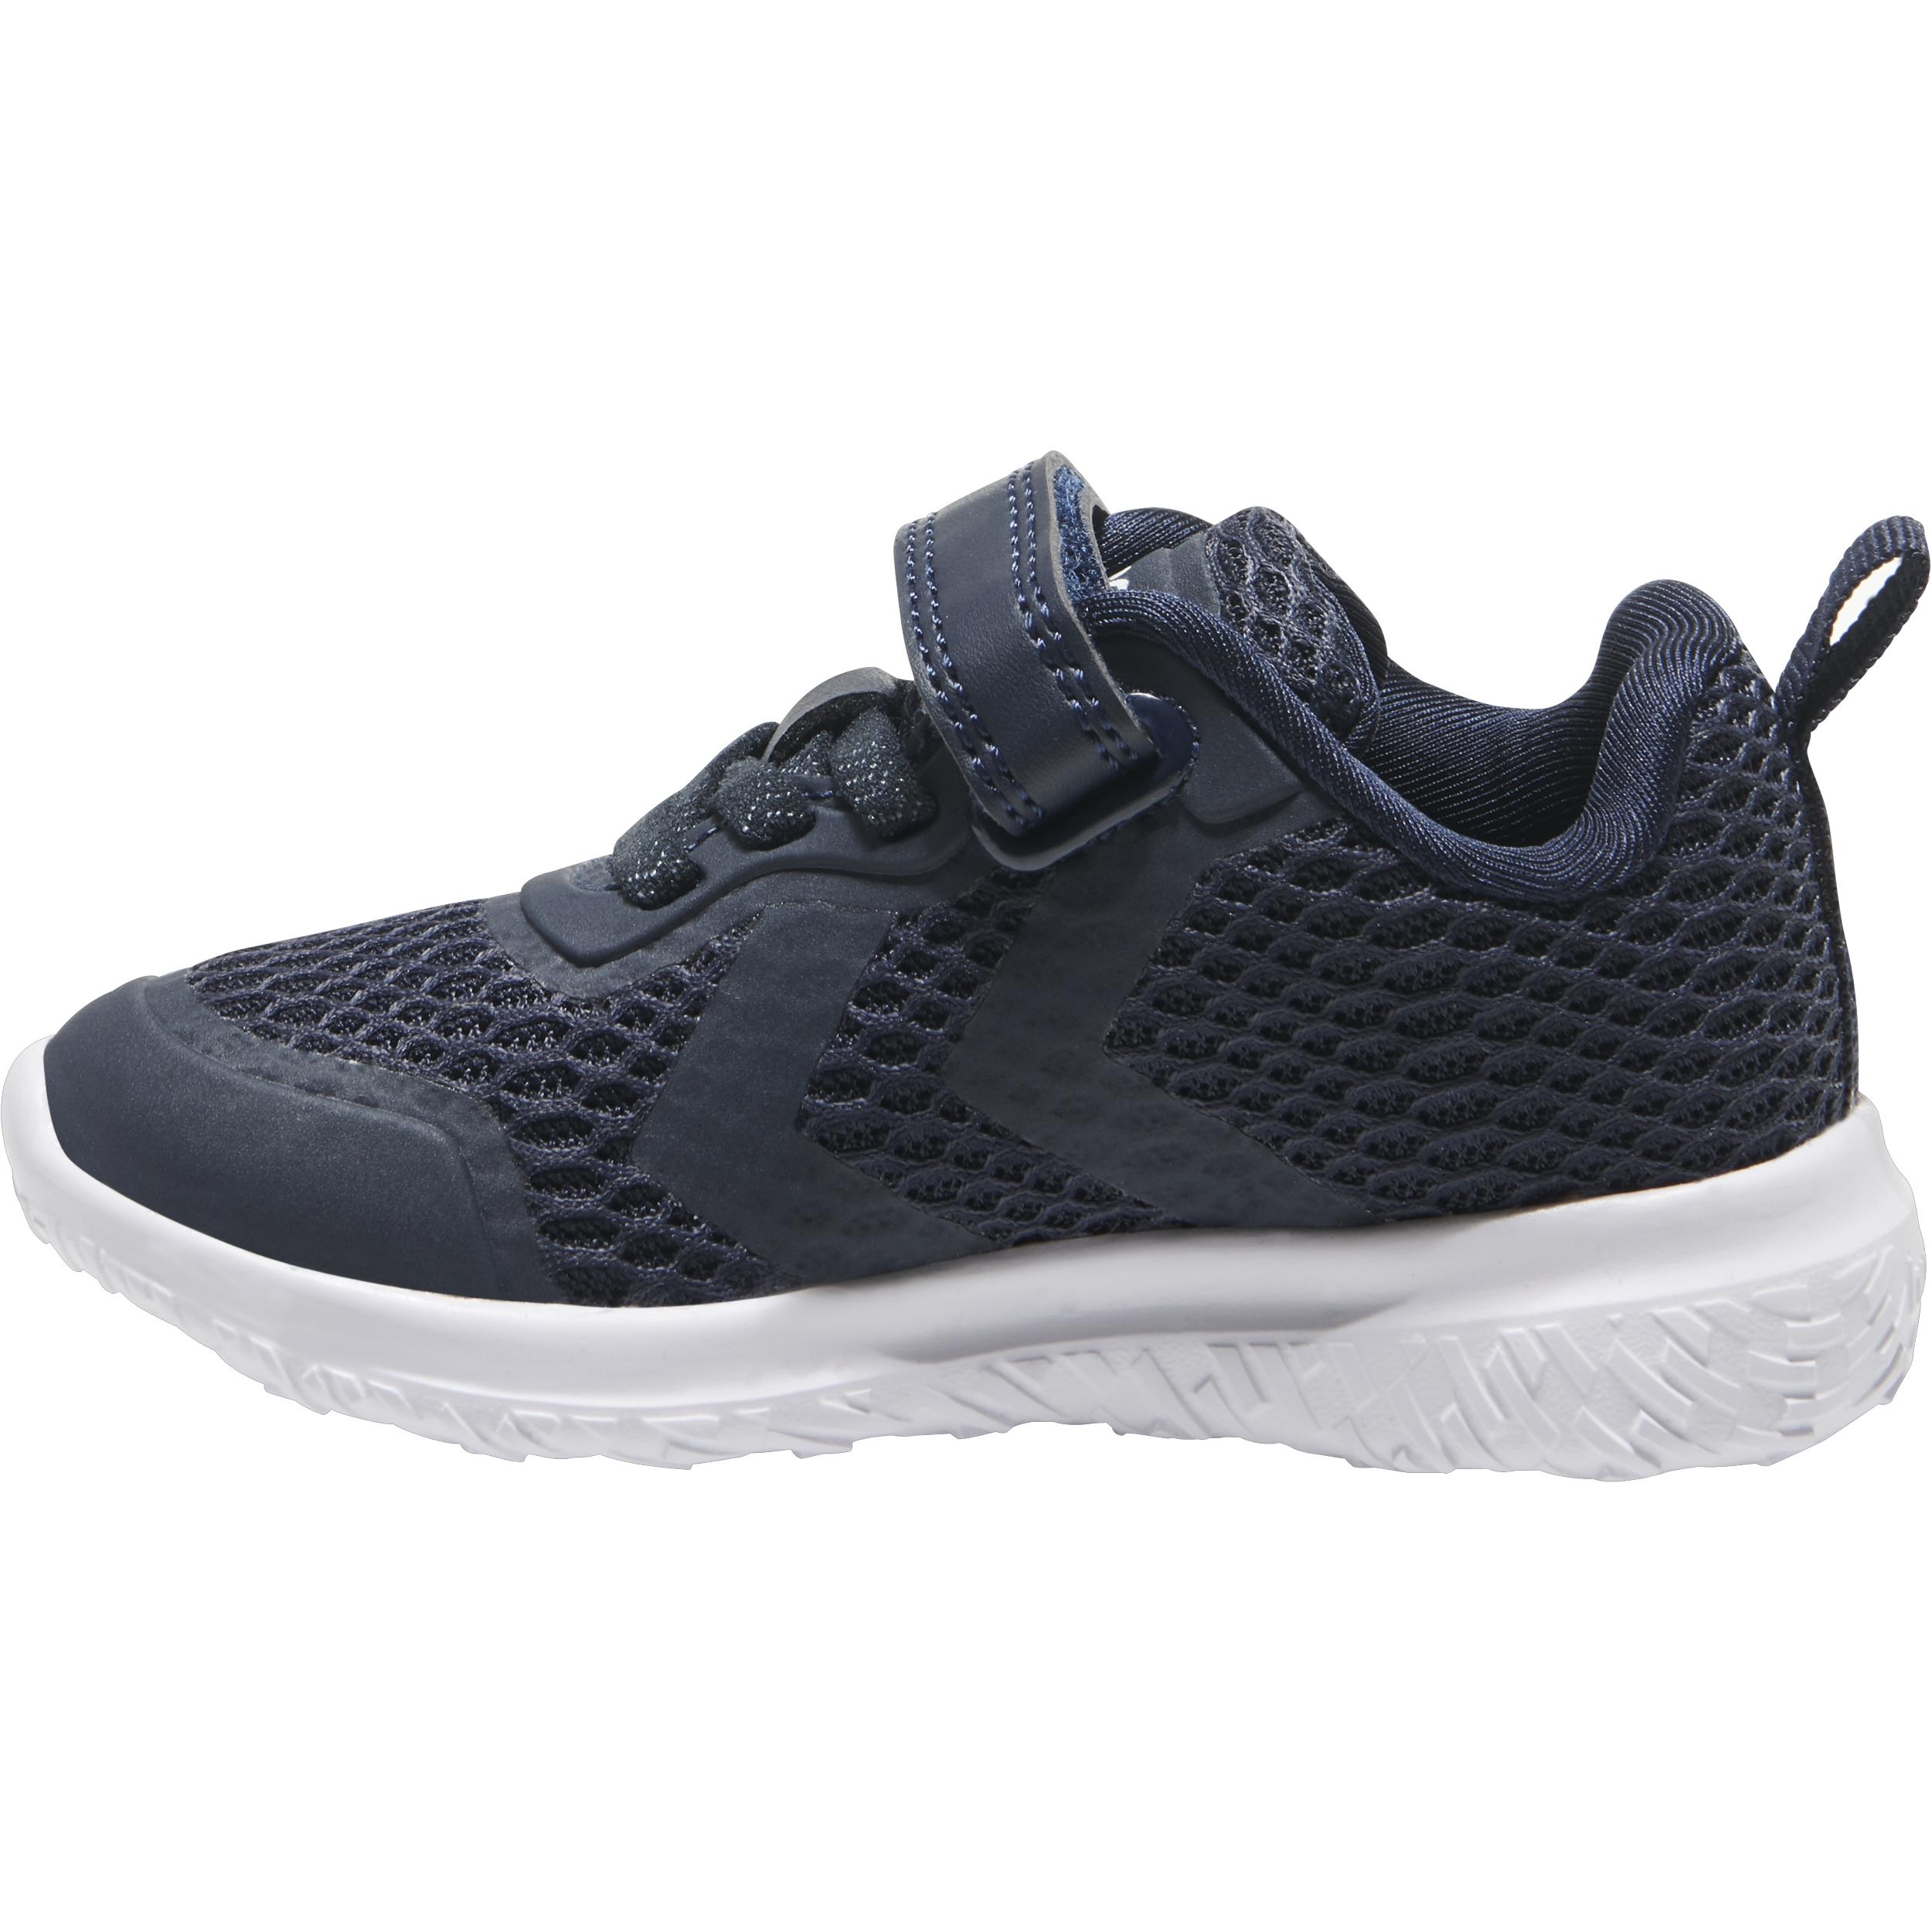 Hummel Actus Ml Infant sneakers, black, 20